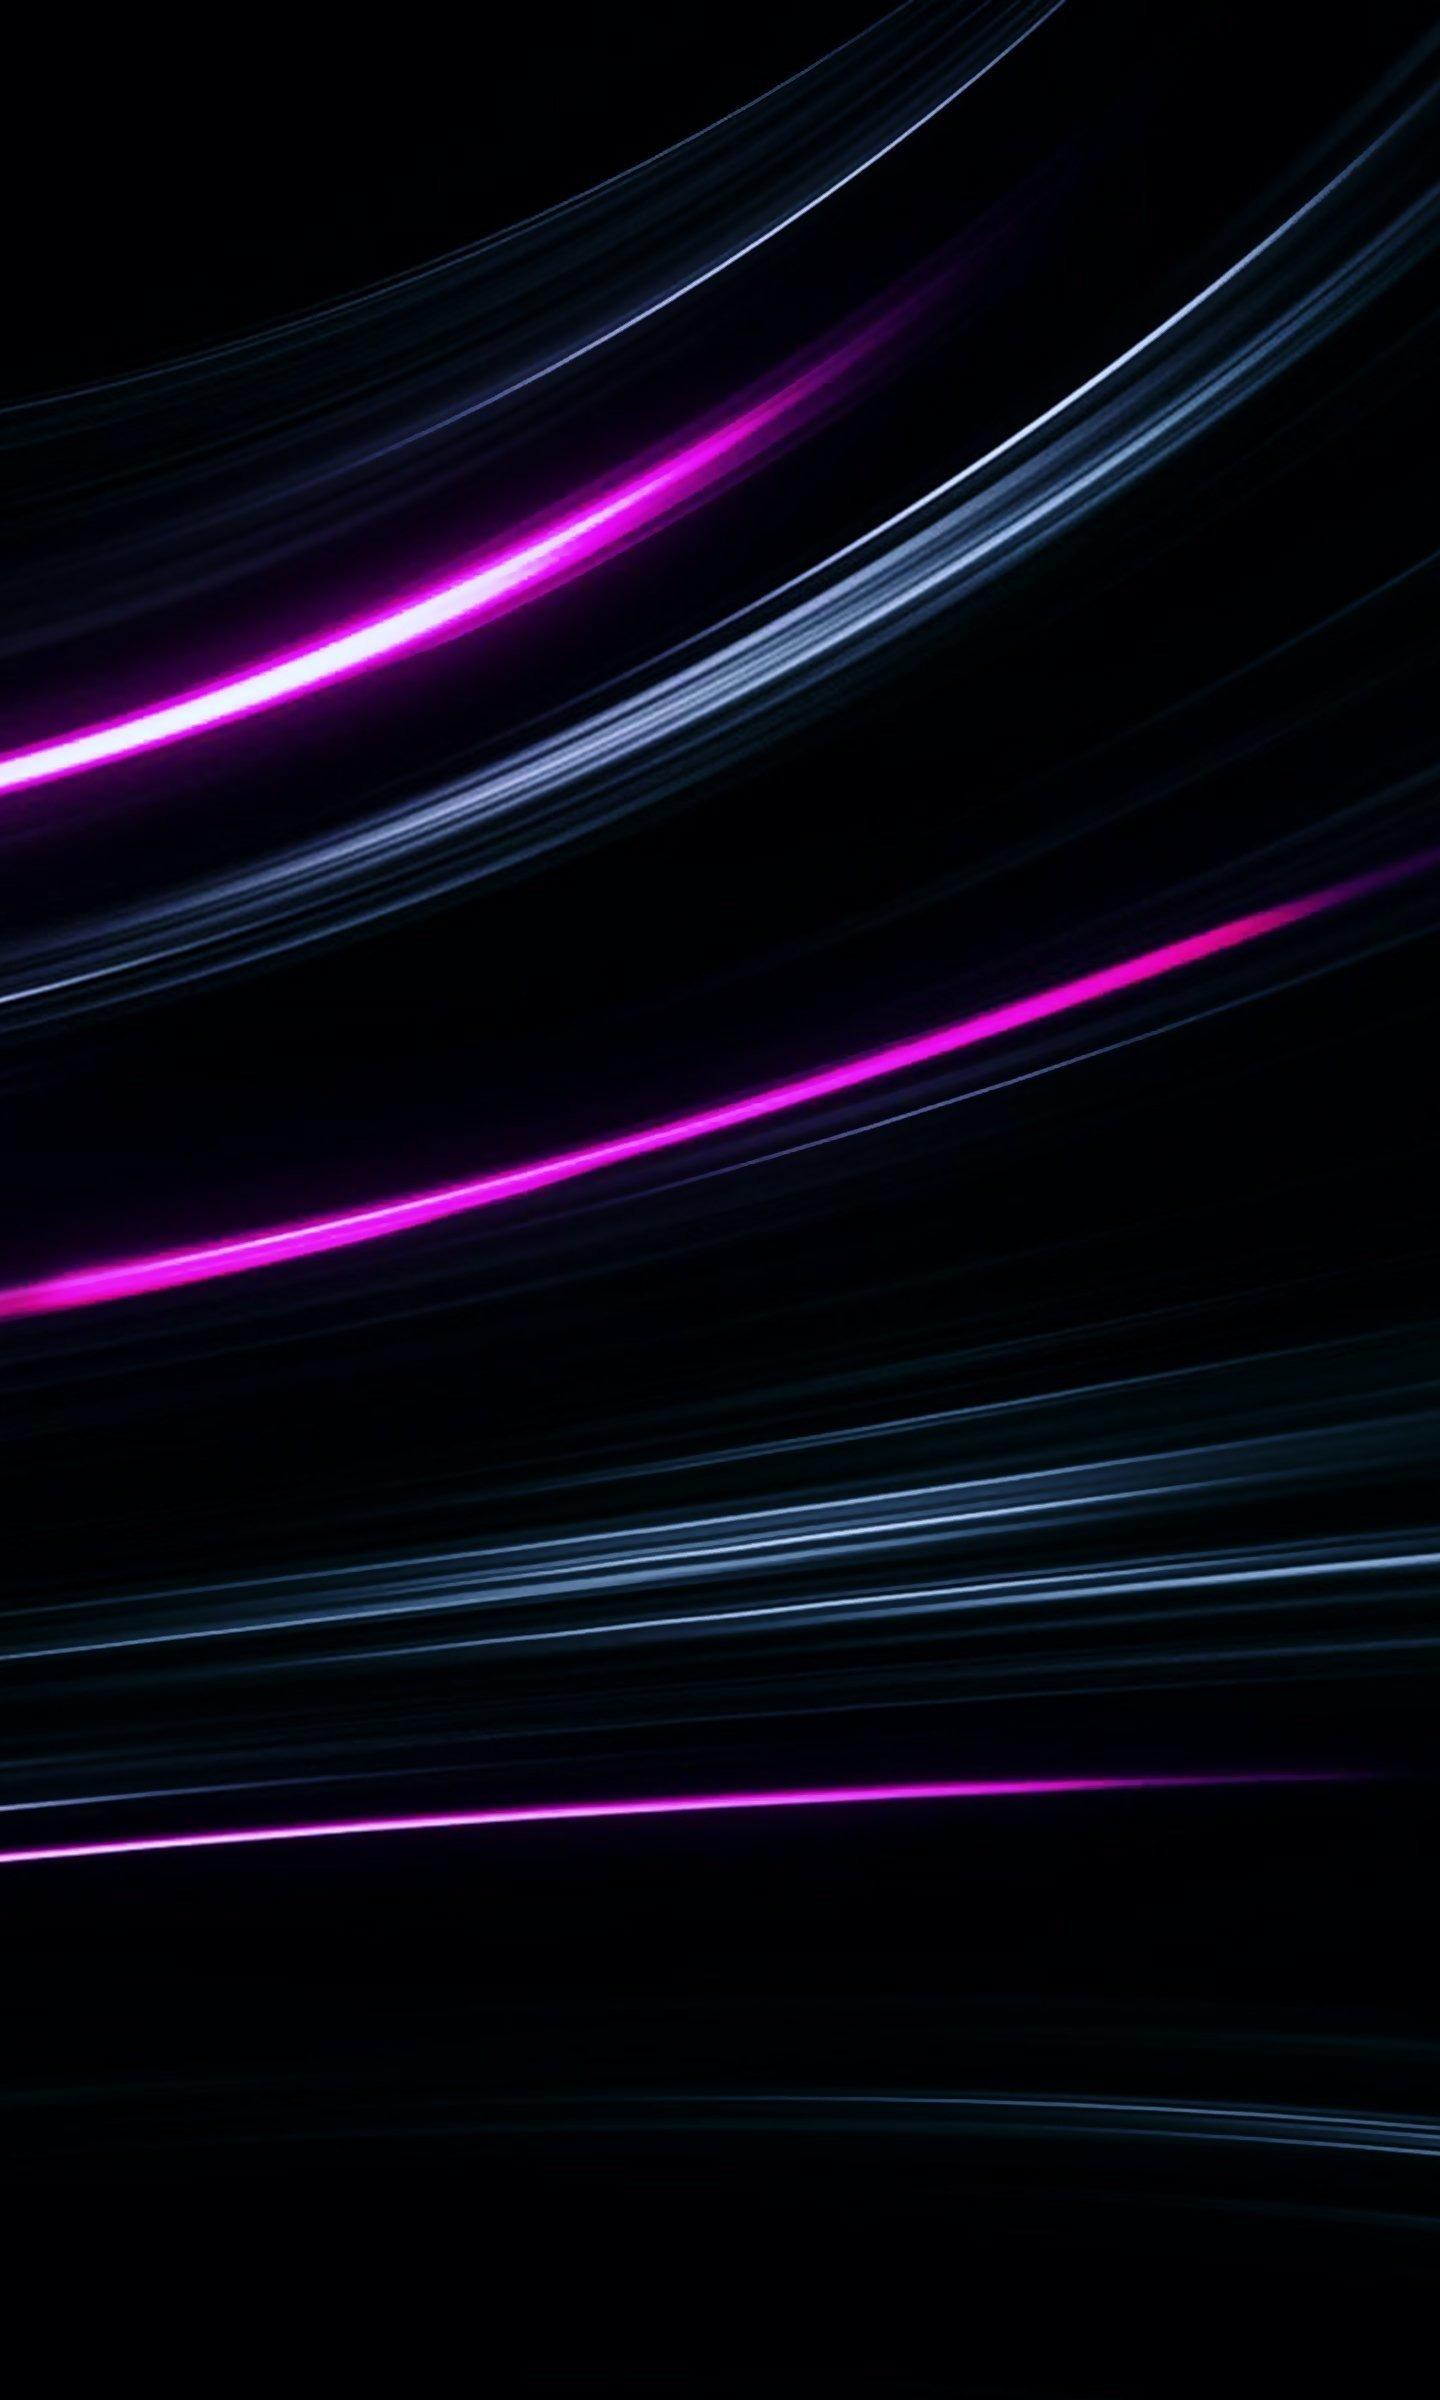 Neon Lines, Abstract, Glowing Lines, Wallpaper - Darkness - HD Wallpaper